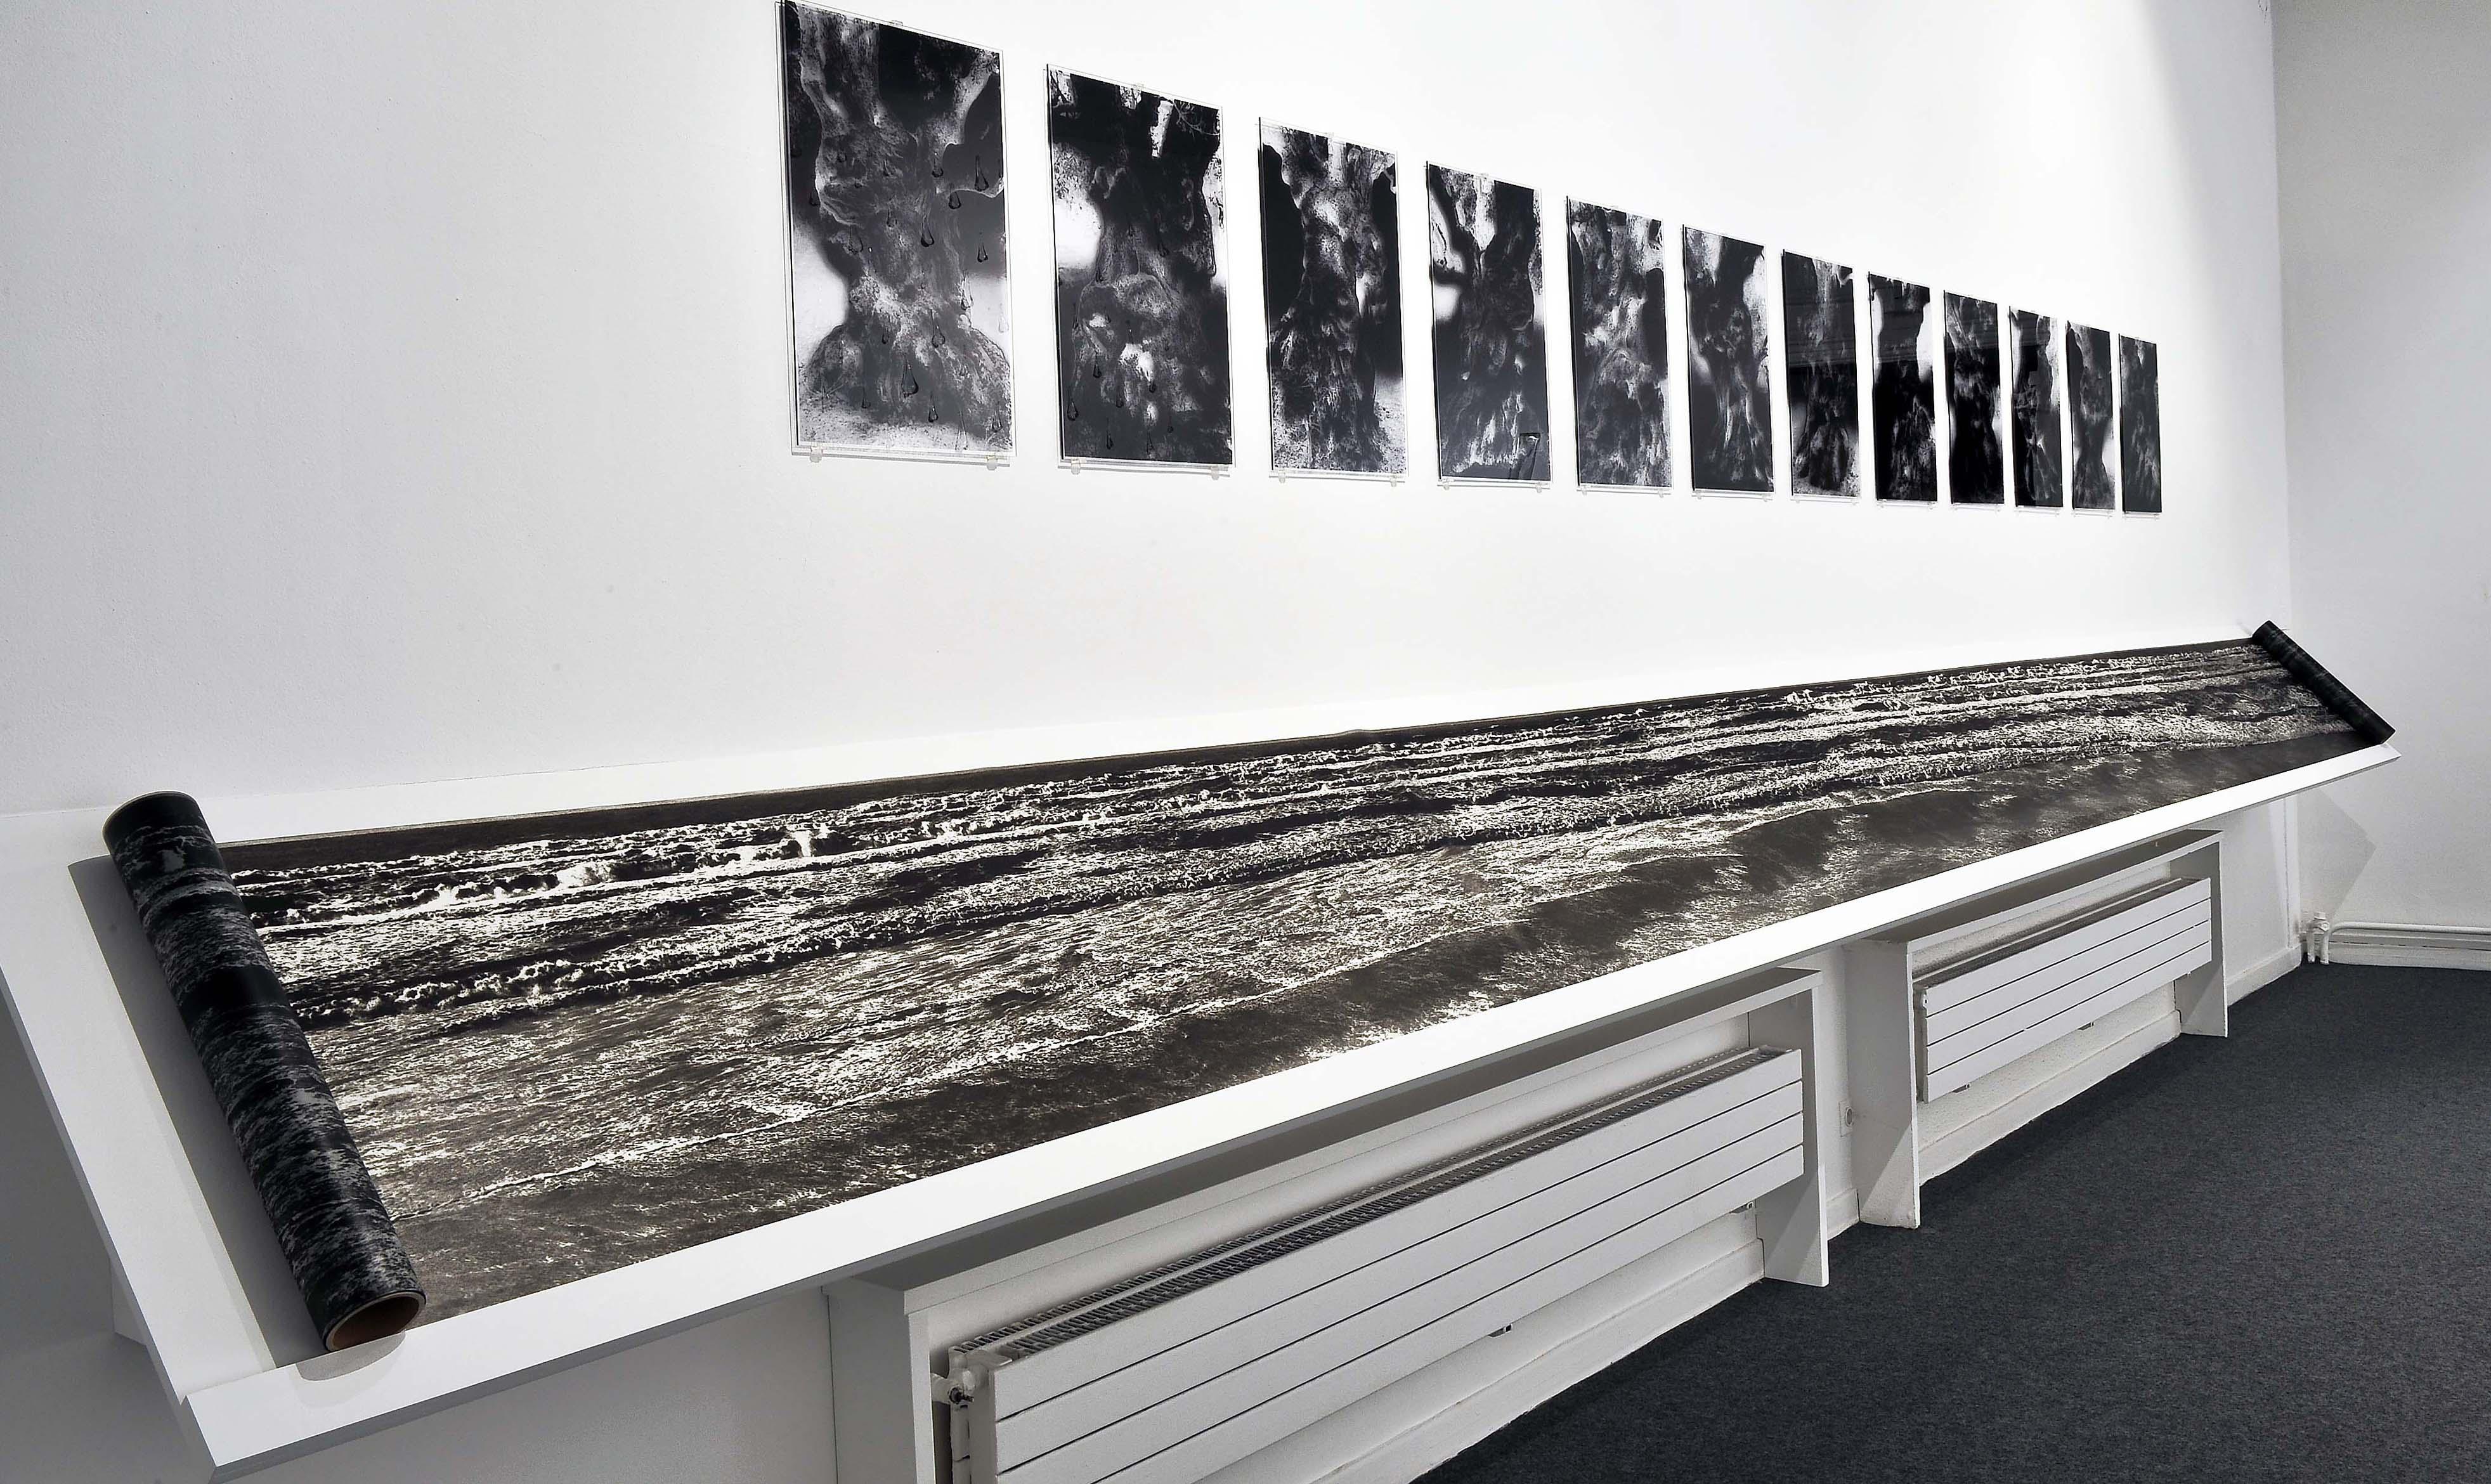 Exposition Icare encore, Helene Mugot 22 rue Henri Kleynhoff 94250 Gentilly, Musee Mandet, Riom, dep63, France